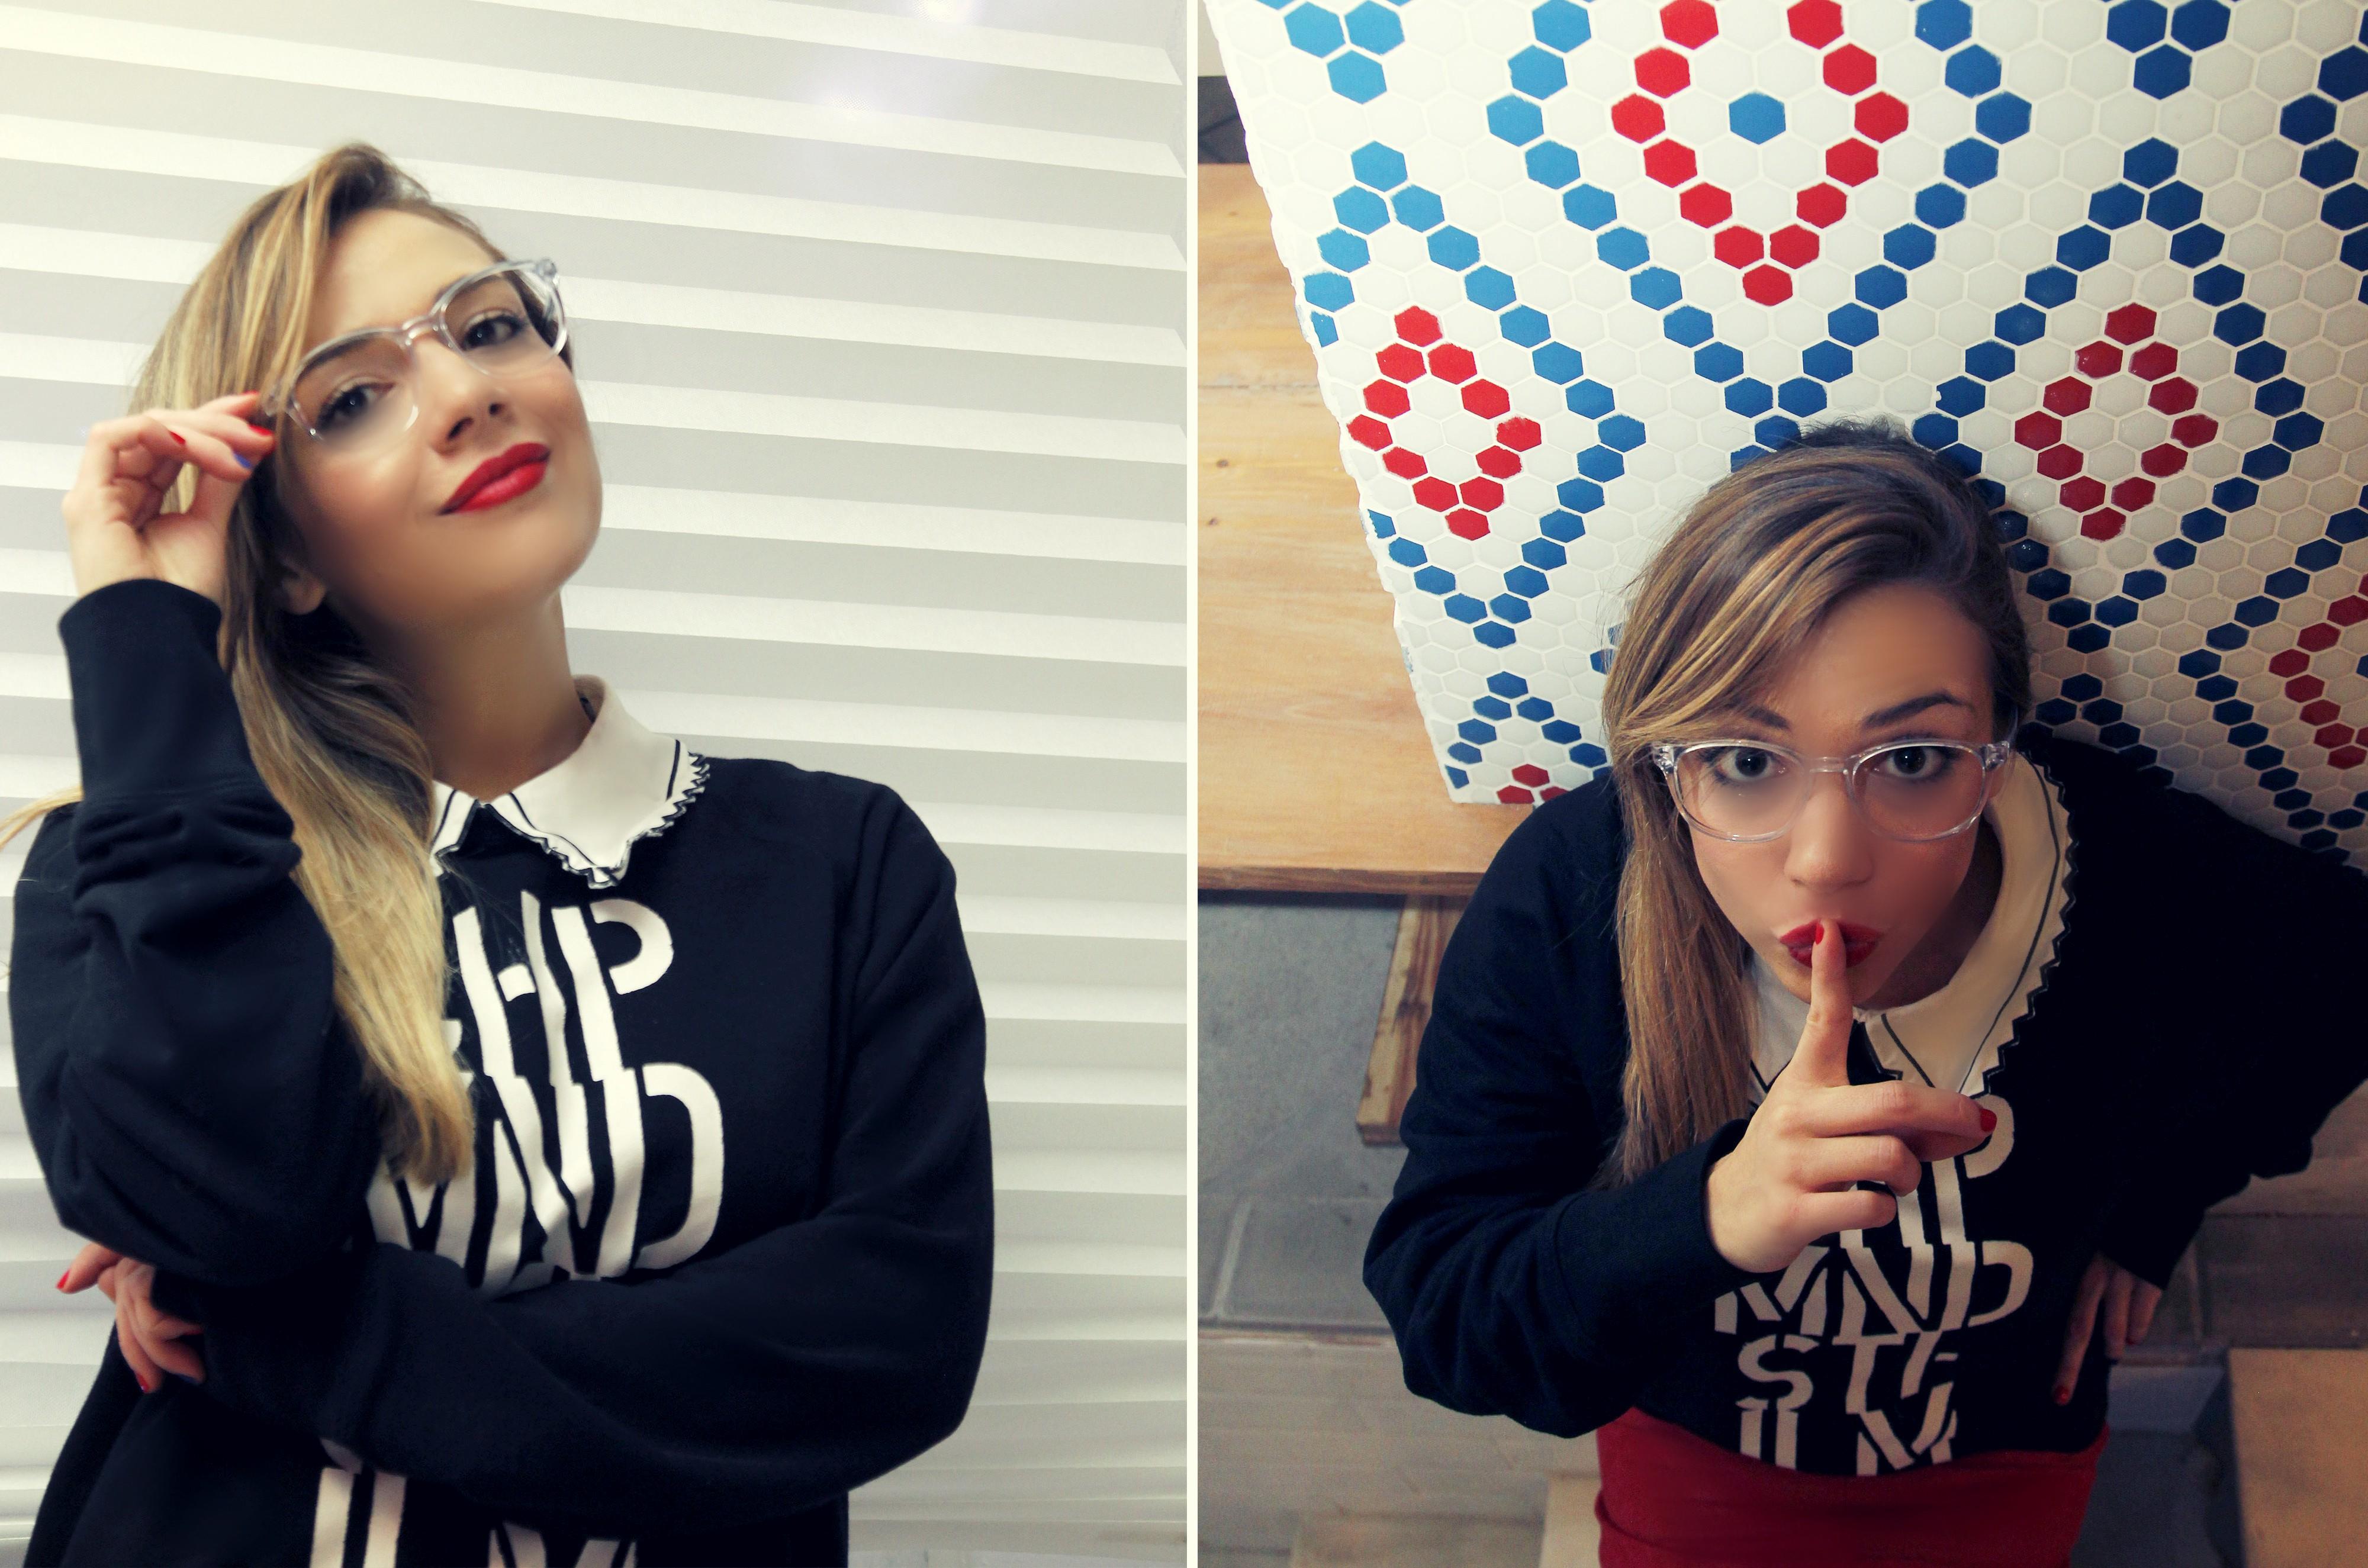 Fashionista-blog-de-moda-ChicAdicta-Malasna-CheapMondaylook-neubau-eyewear-gafas-de-sol-modernas-trendy-glasses-PiensaenChic-Piensa-en-Chic